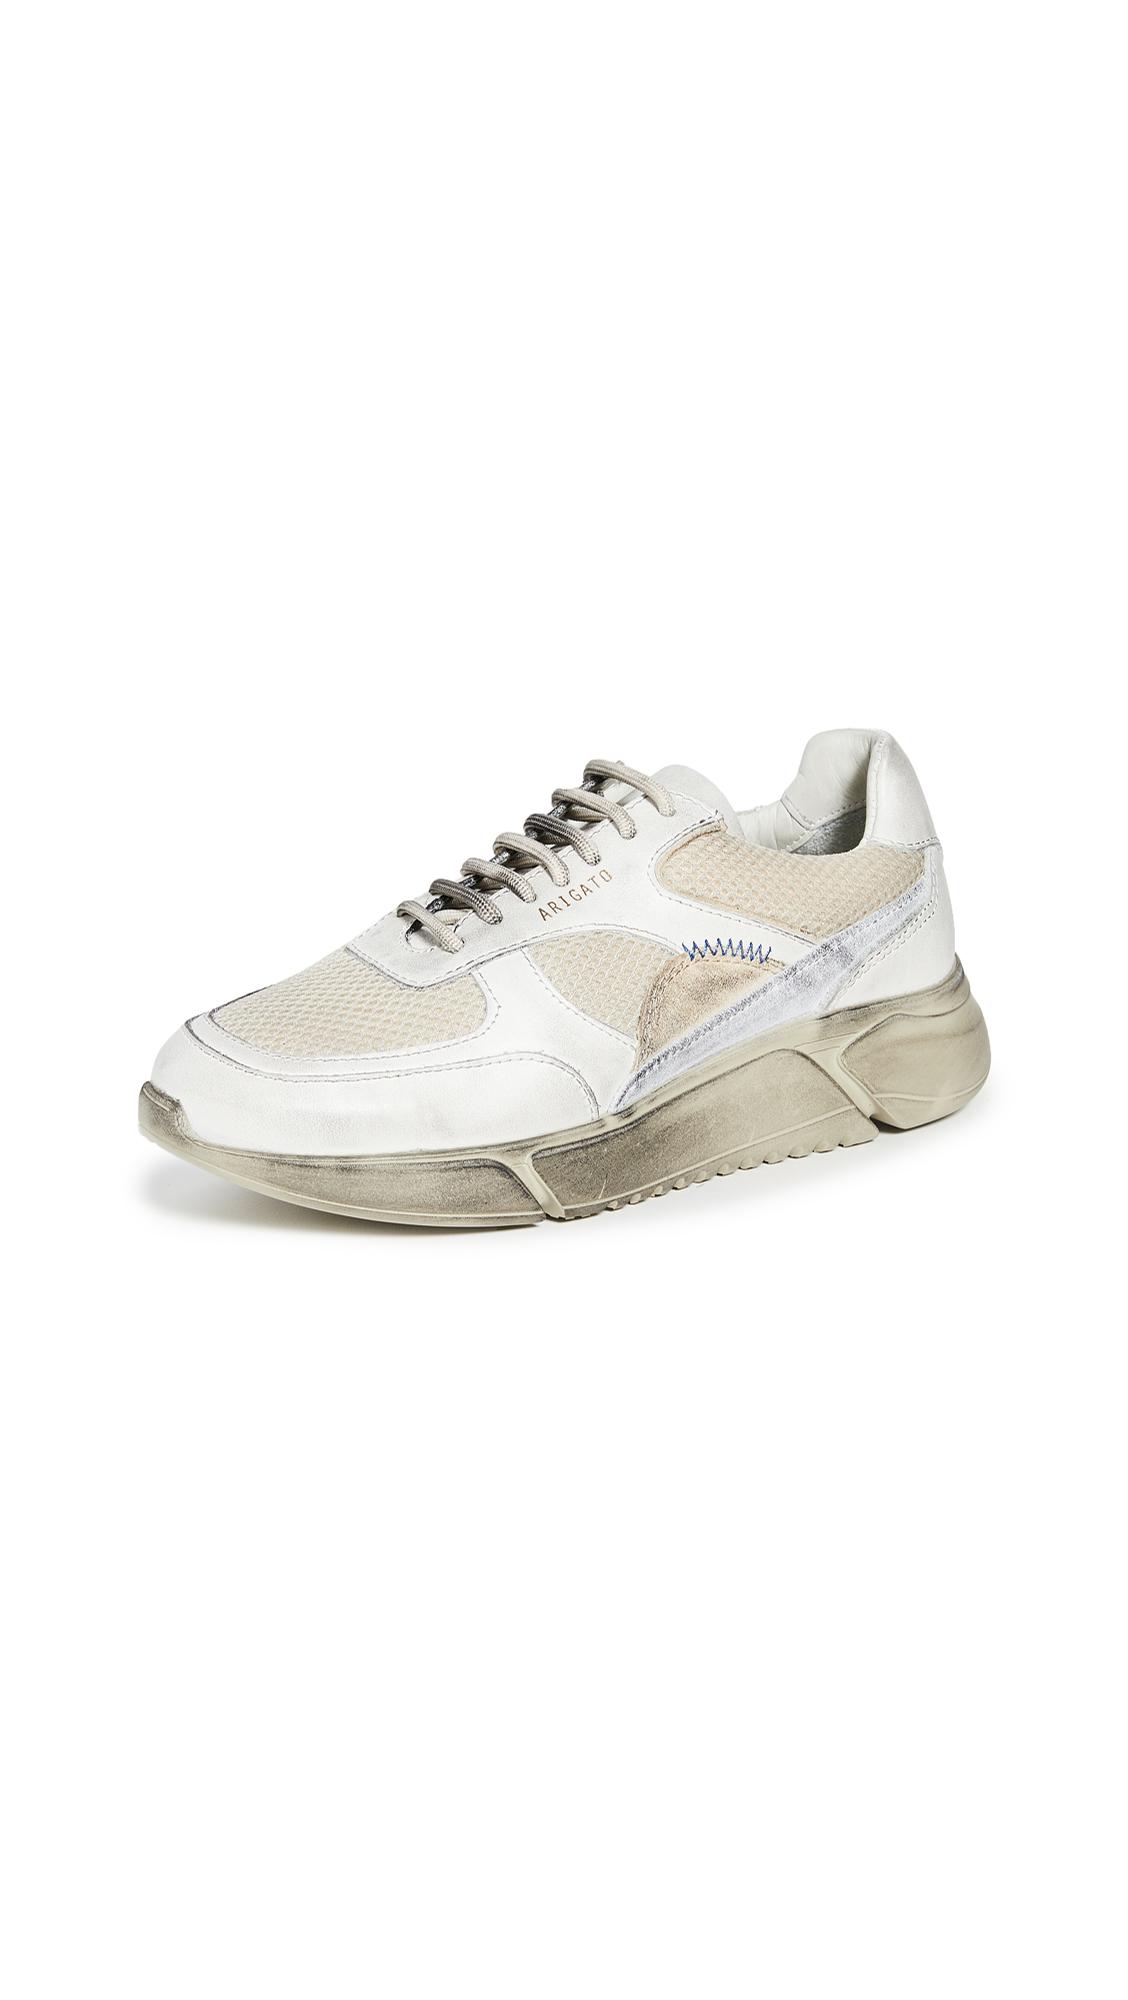 Axel Arigato Genesis Sneakers - Beige/White